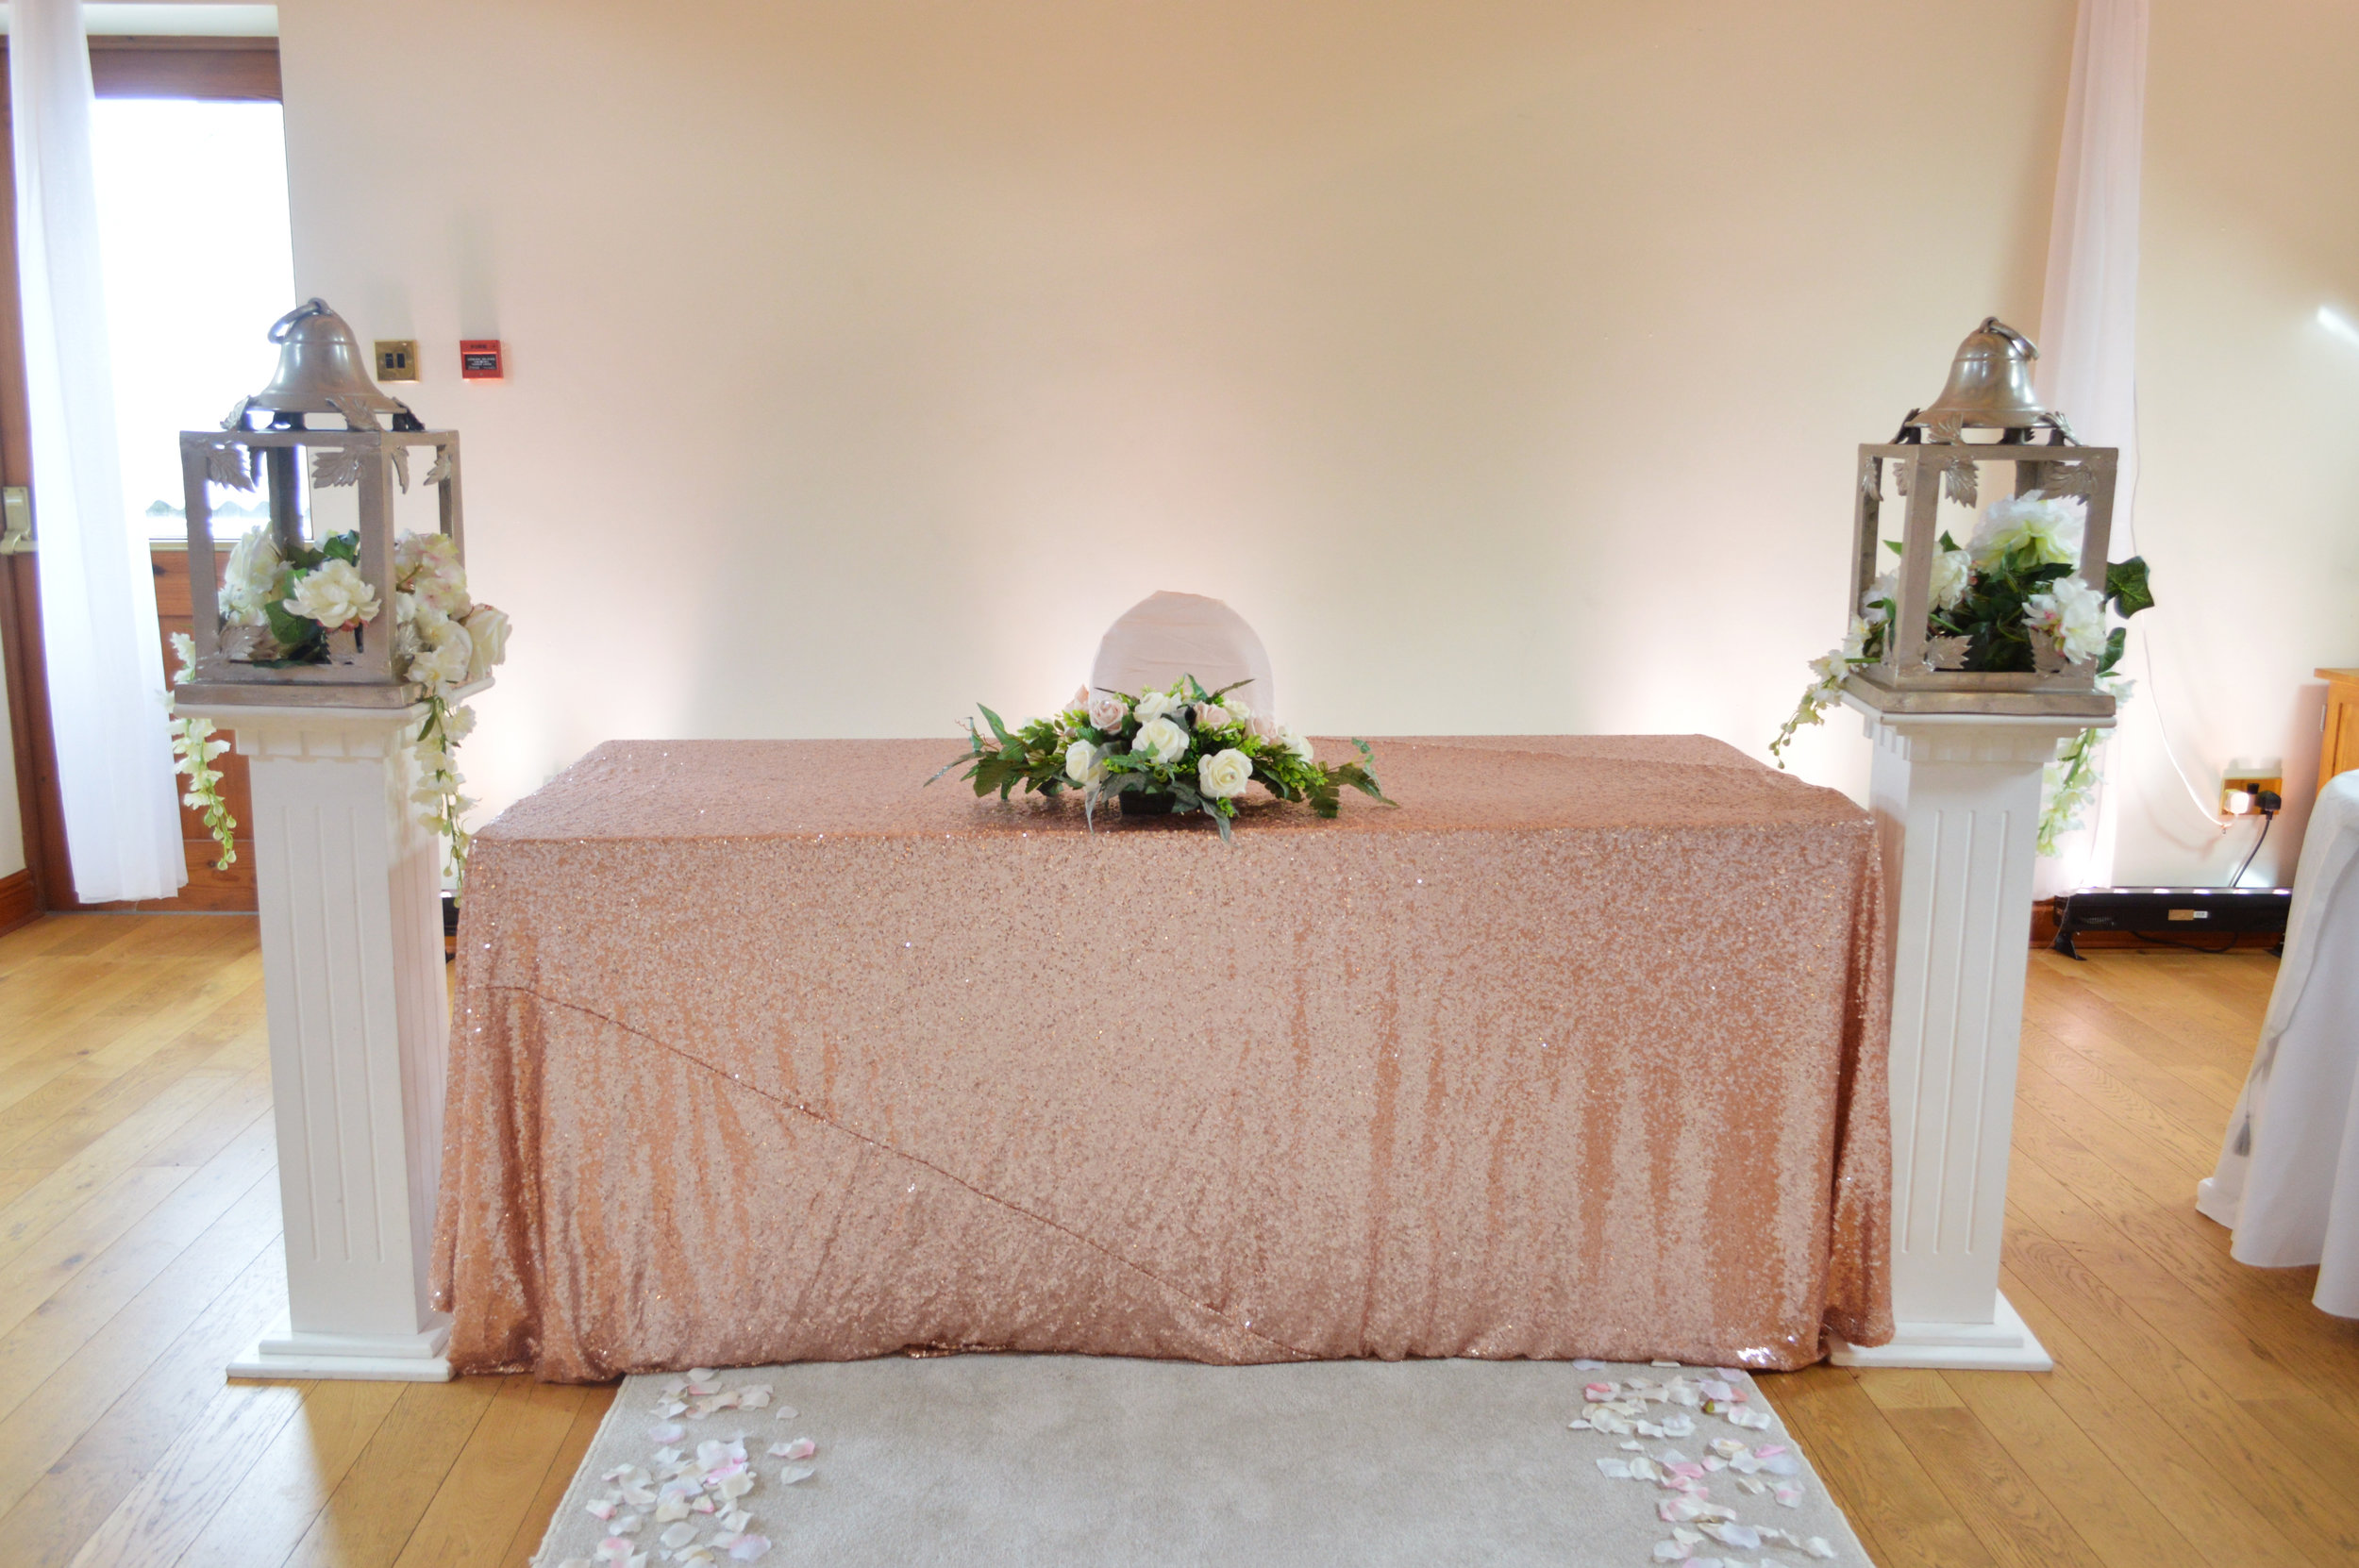 Sequin registrar table cloth